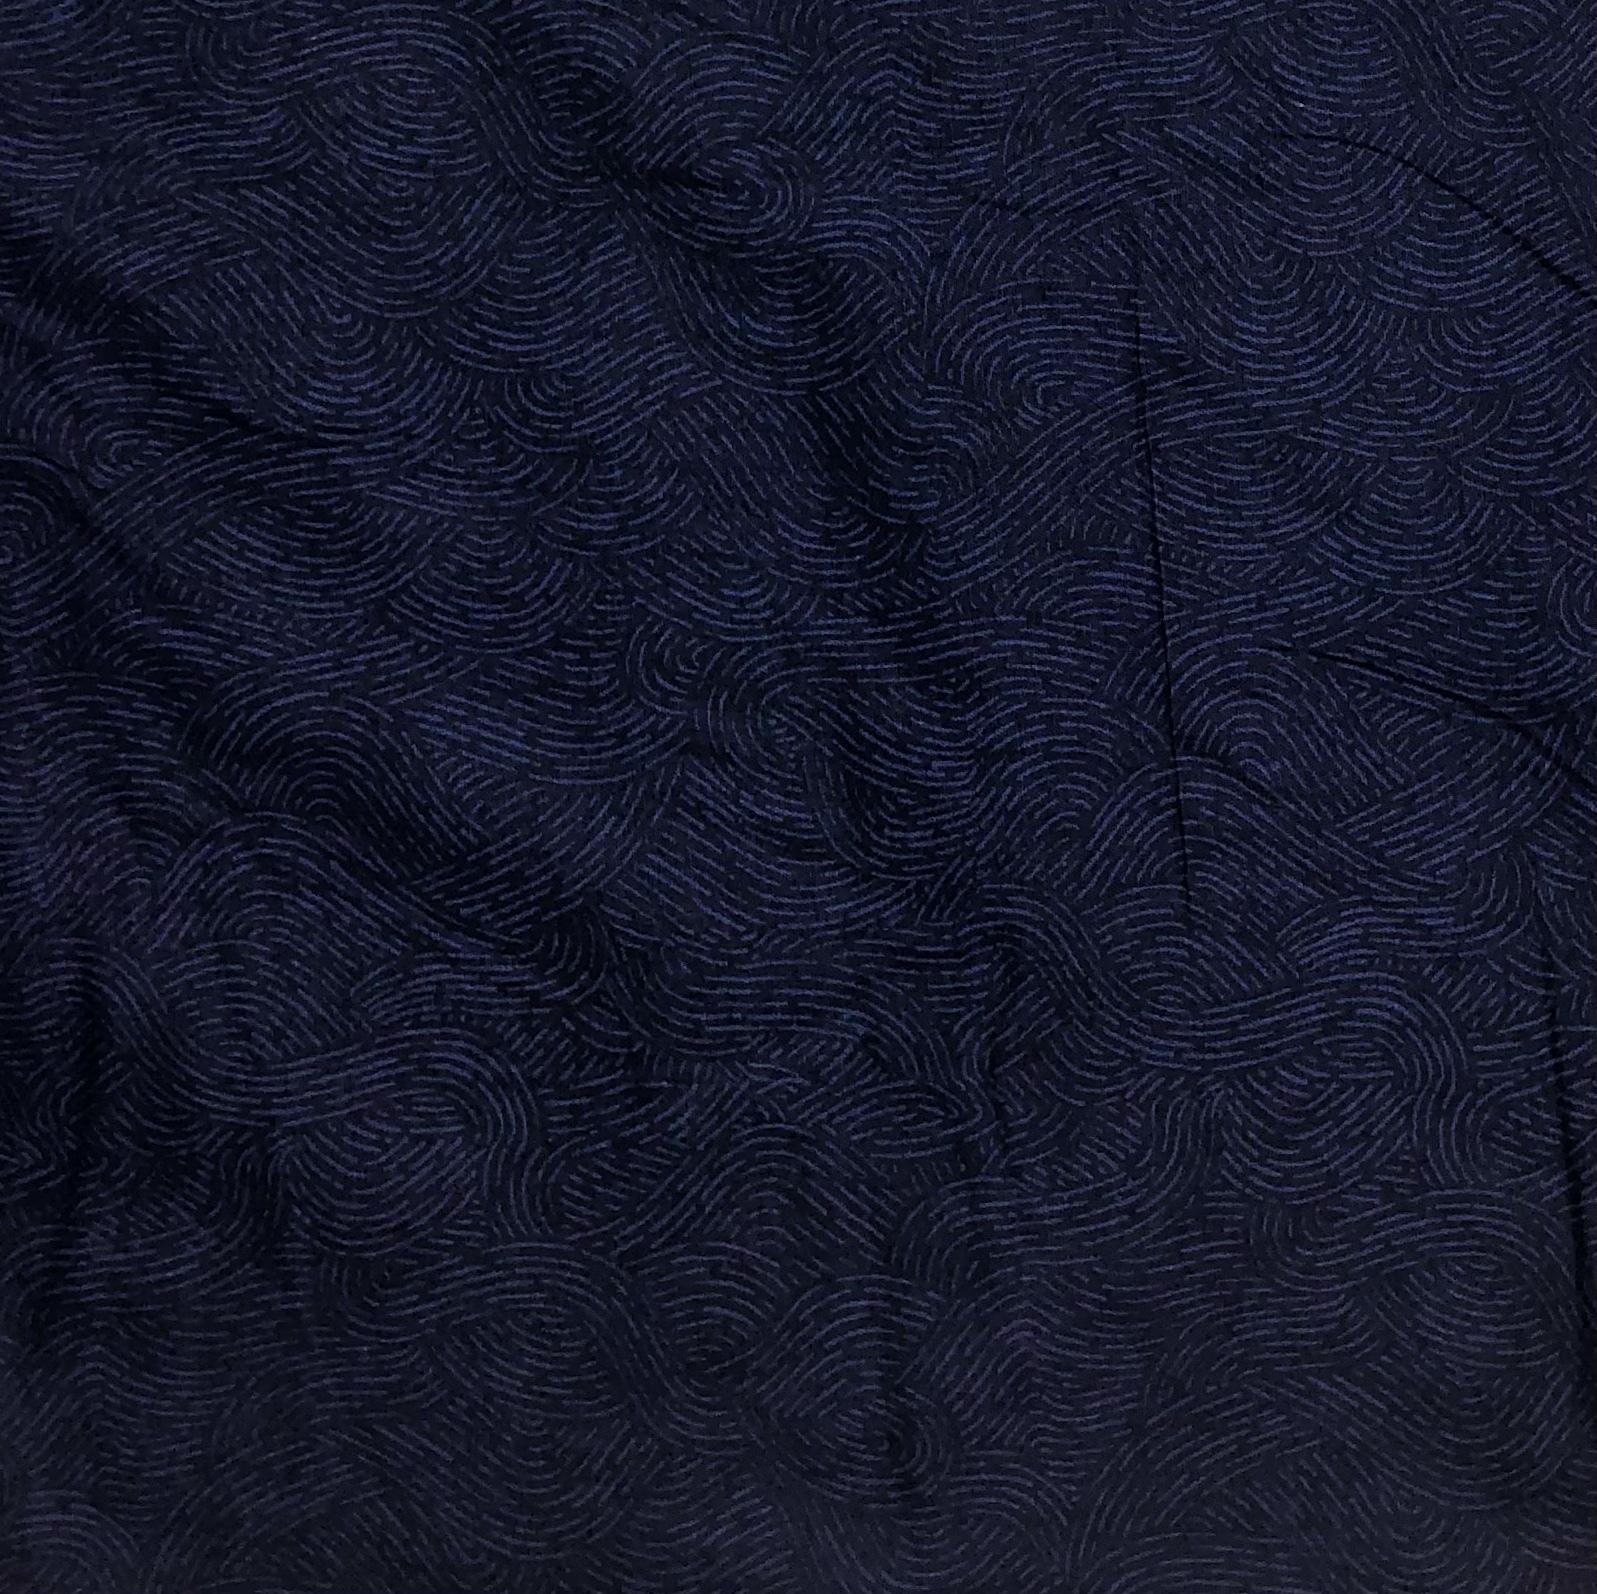 "Flannel 108"" - Navy Waves - 1/2m cut 56734"